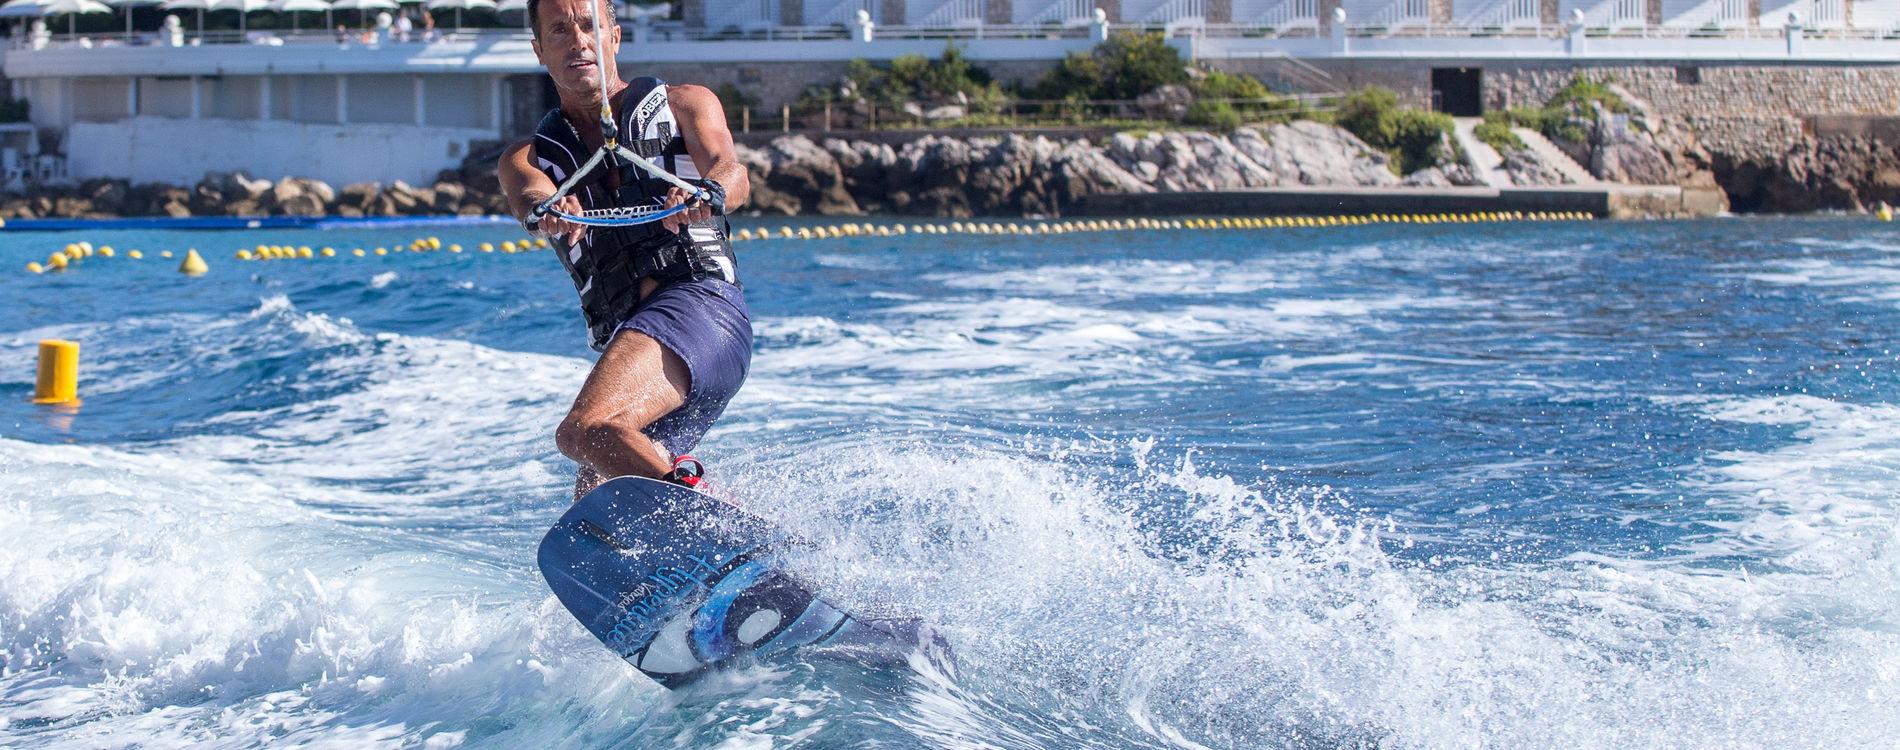 Monte-Carlo Beach - Sports Nautiques